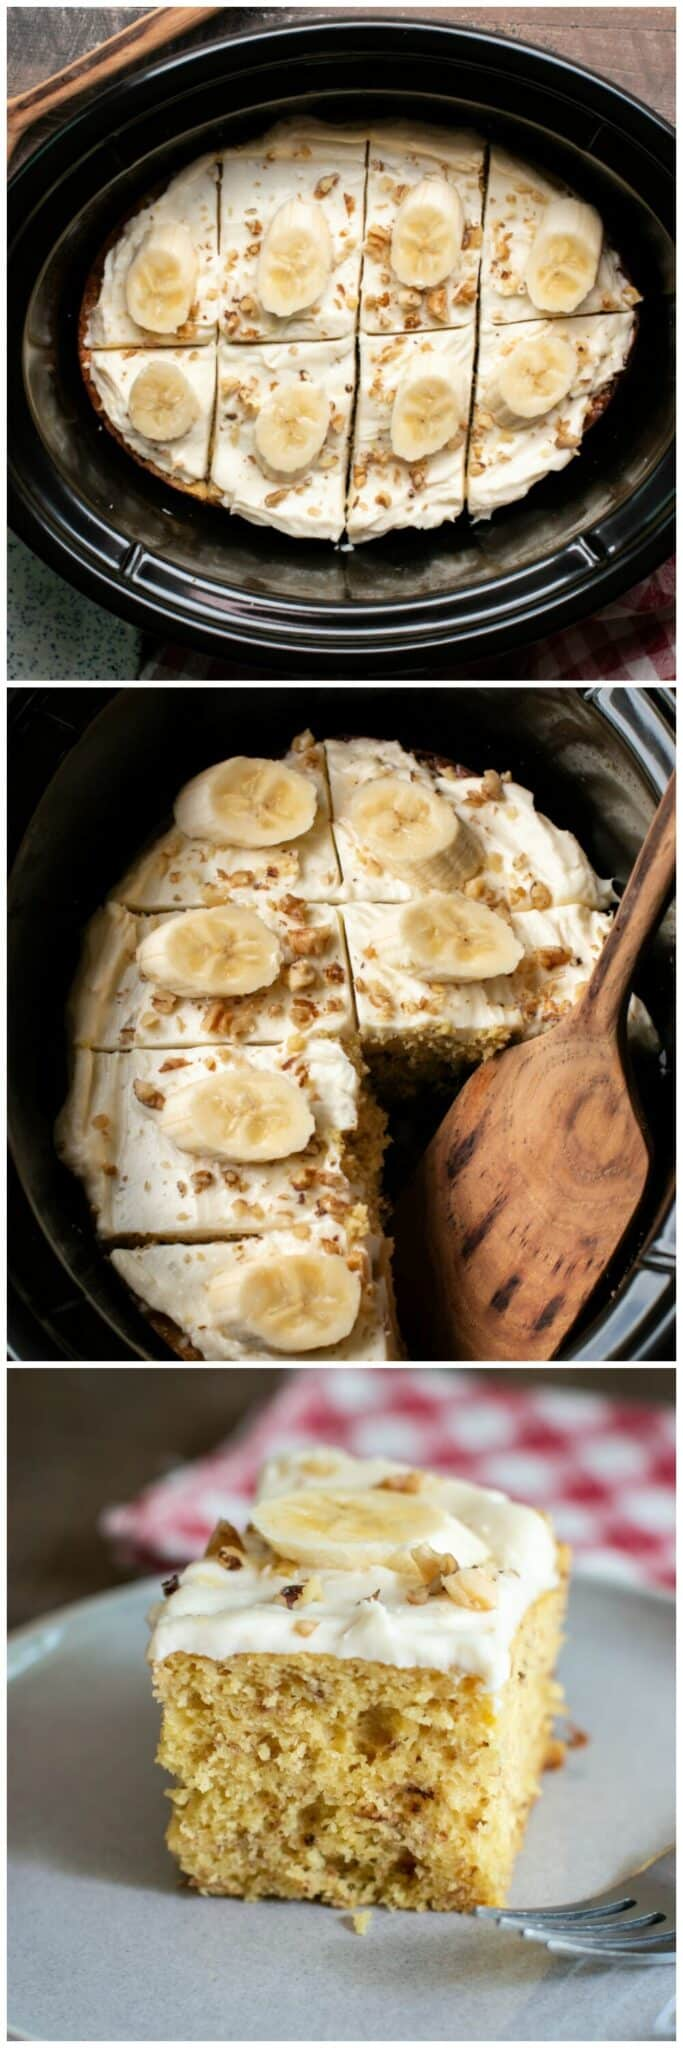 Slow Cooker Banana Nut Cake